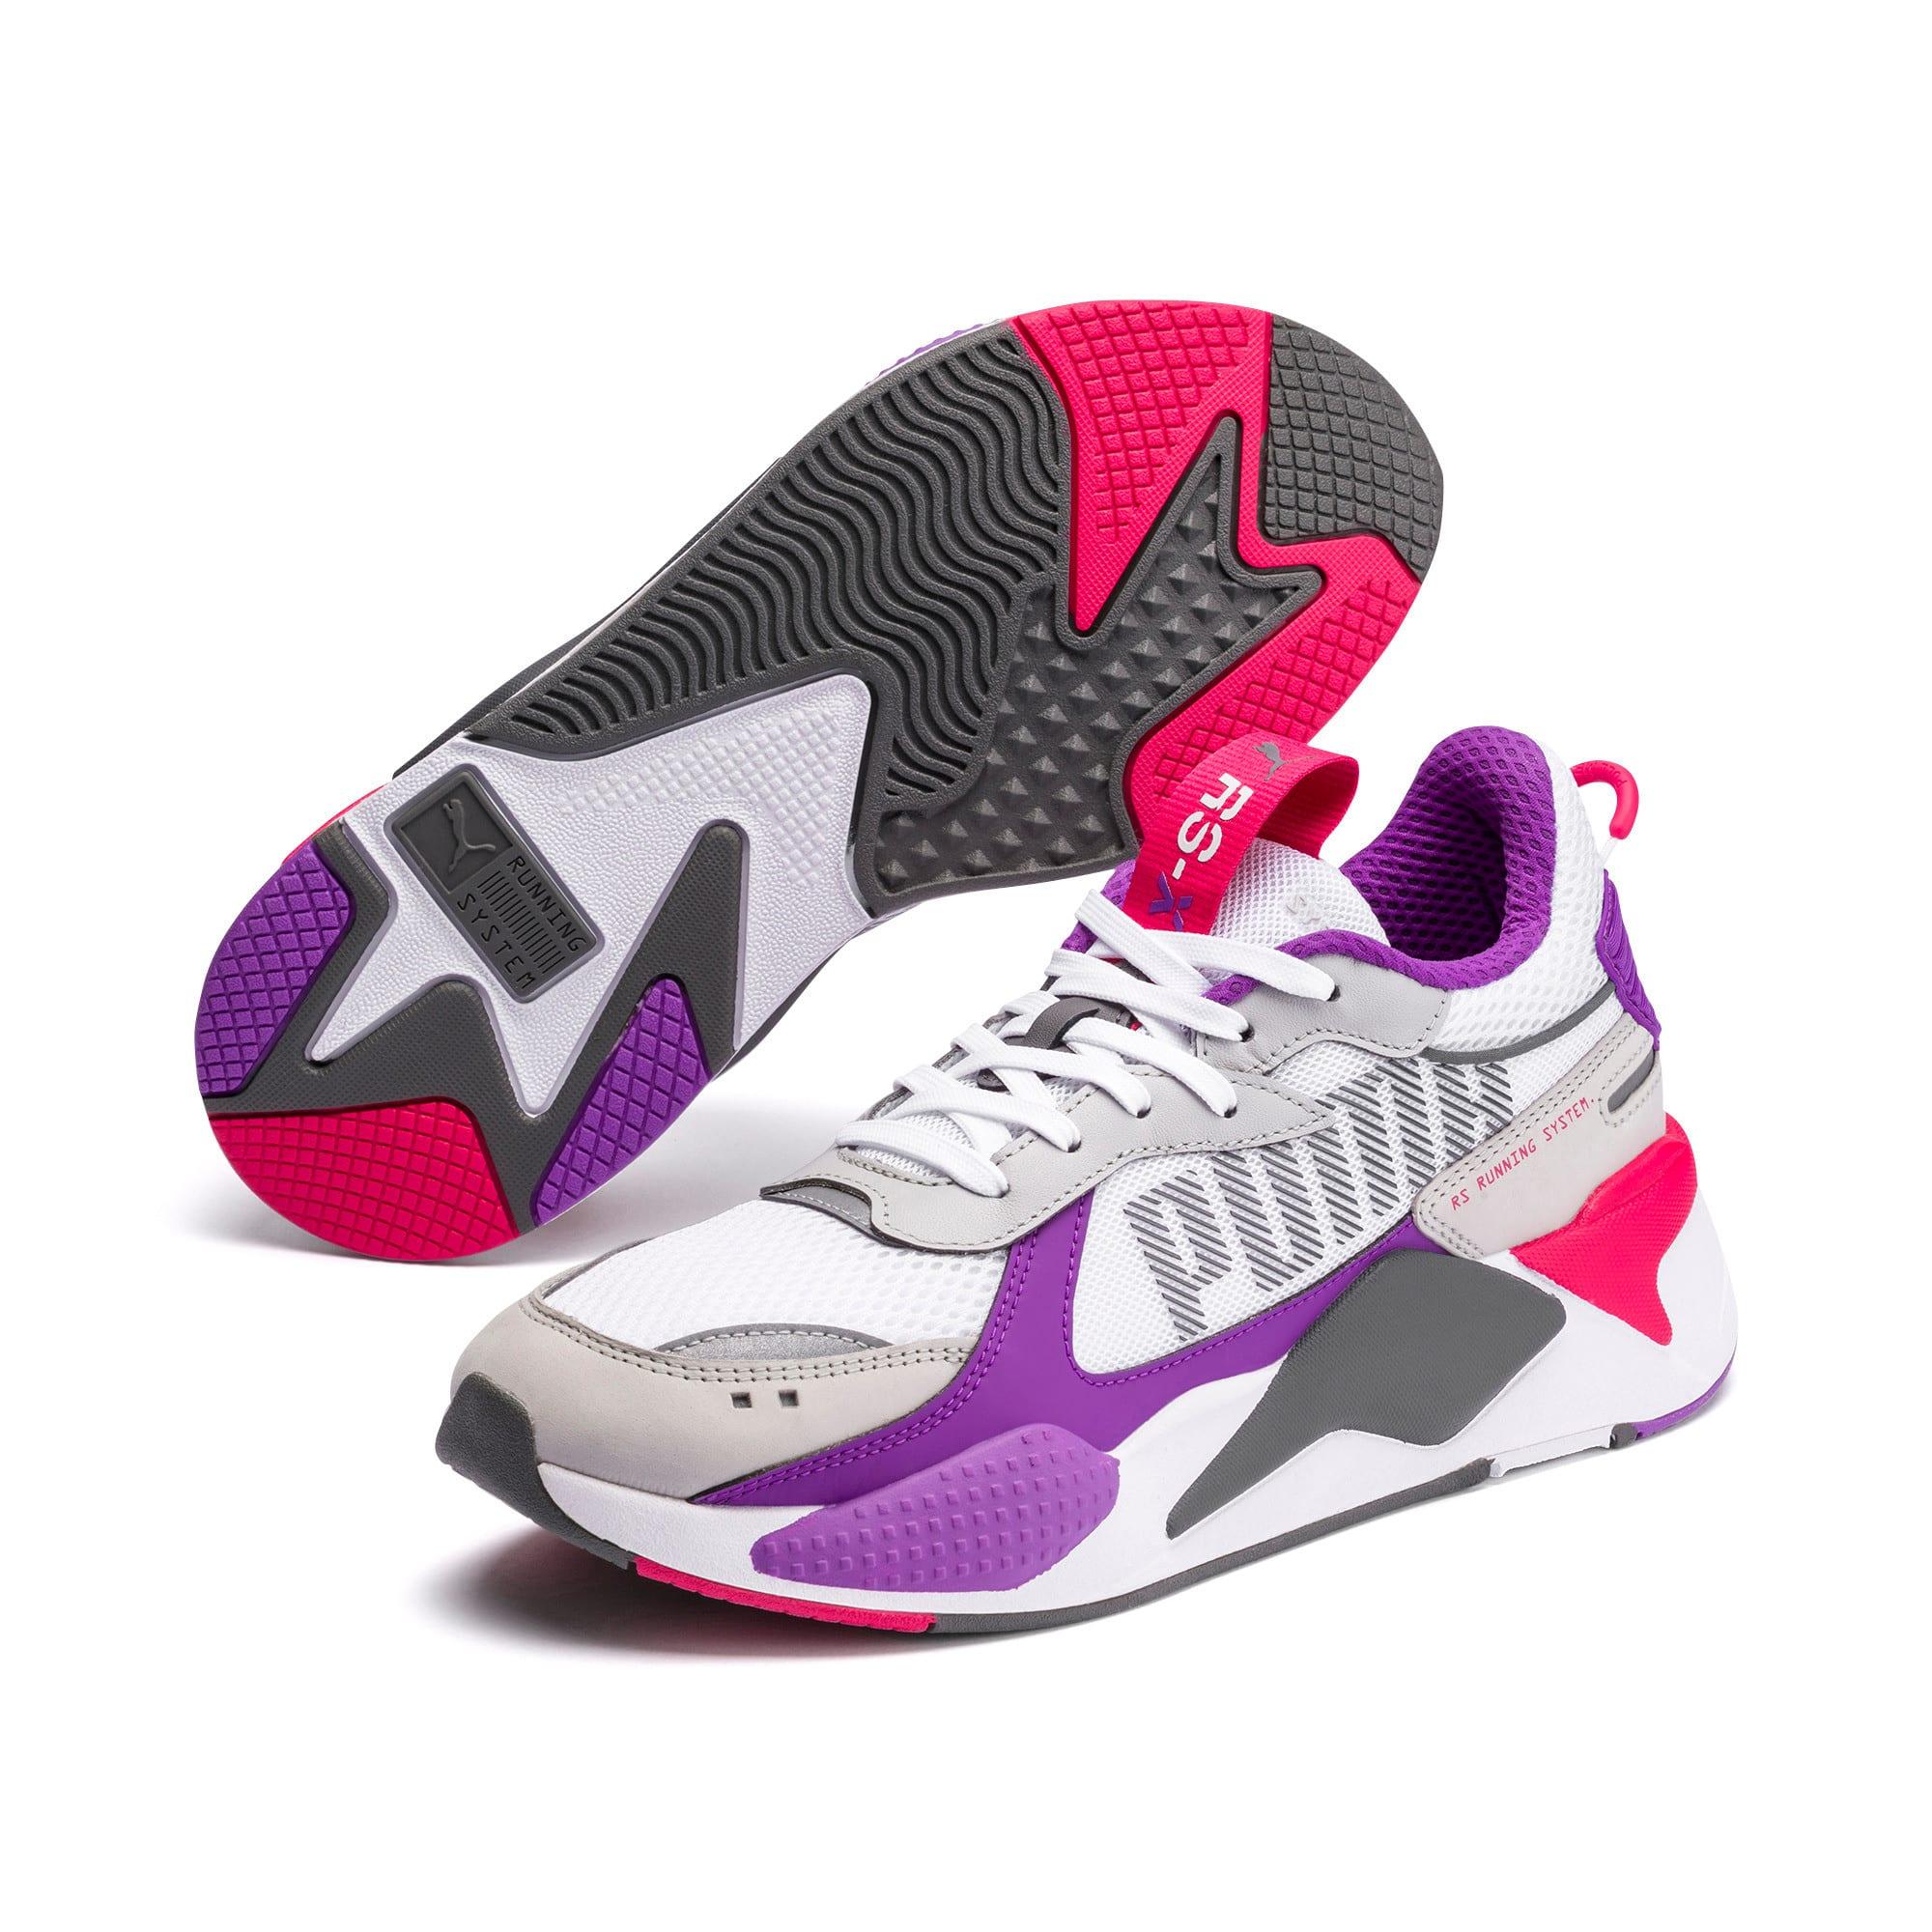 Thumbnail 2 of RS-X Bold Sneaker, PWhite-High Rise-Royal Lilac, medium